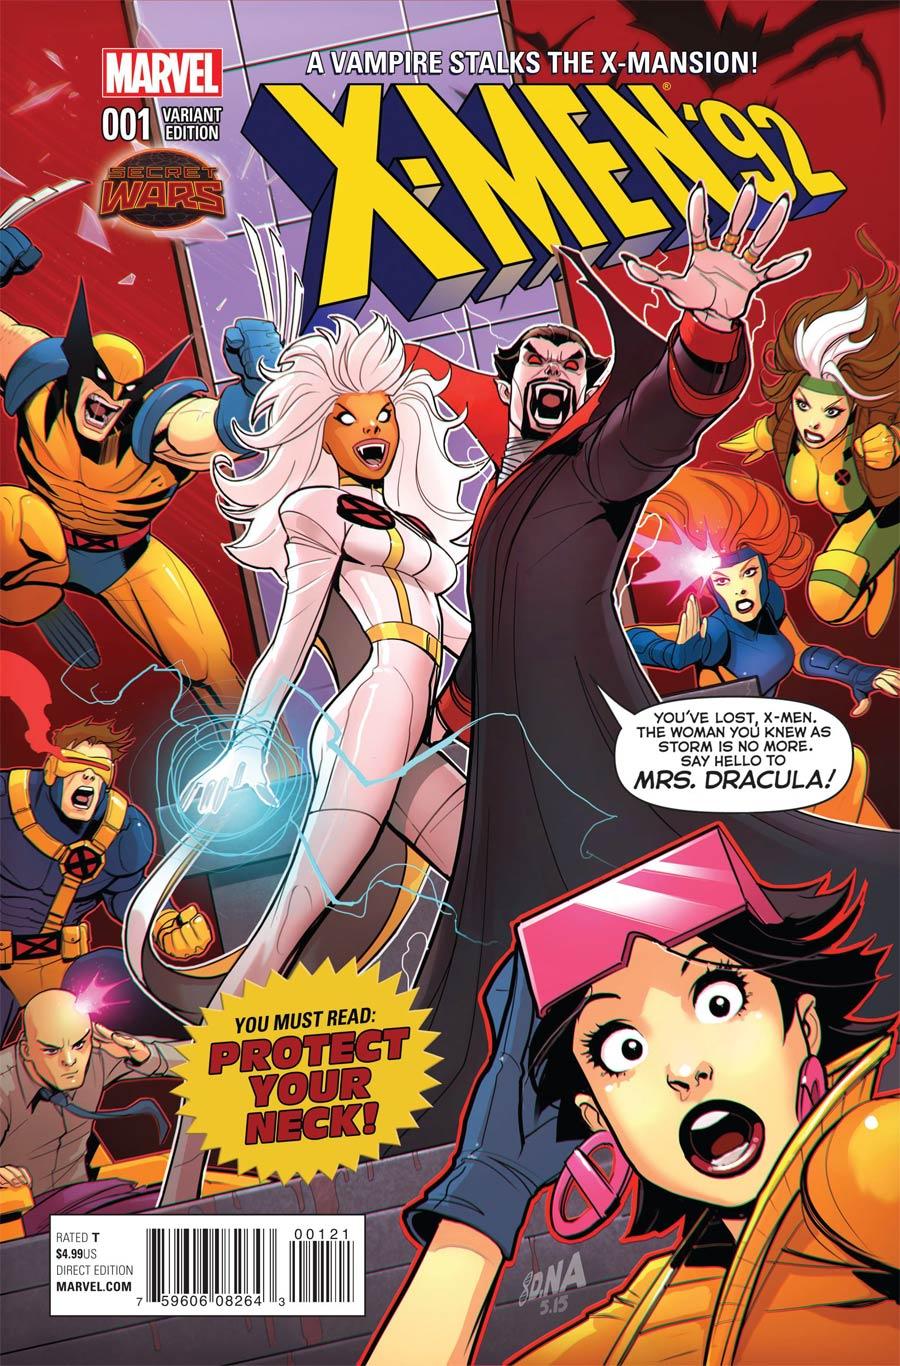 X-Men 92 #1 Cover F Incentive Variant Cover (Secret Wars Warzones Tie-In)